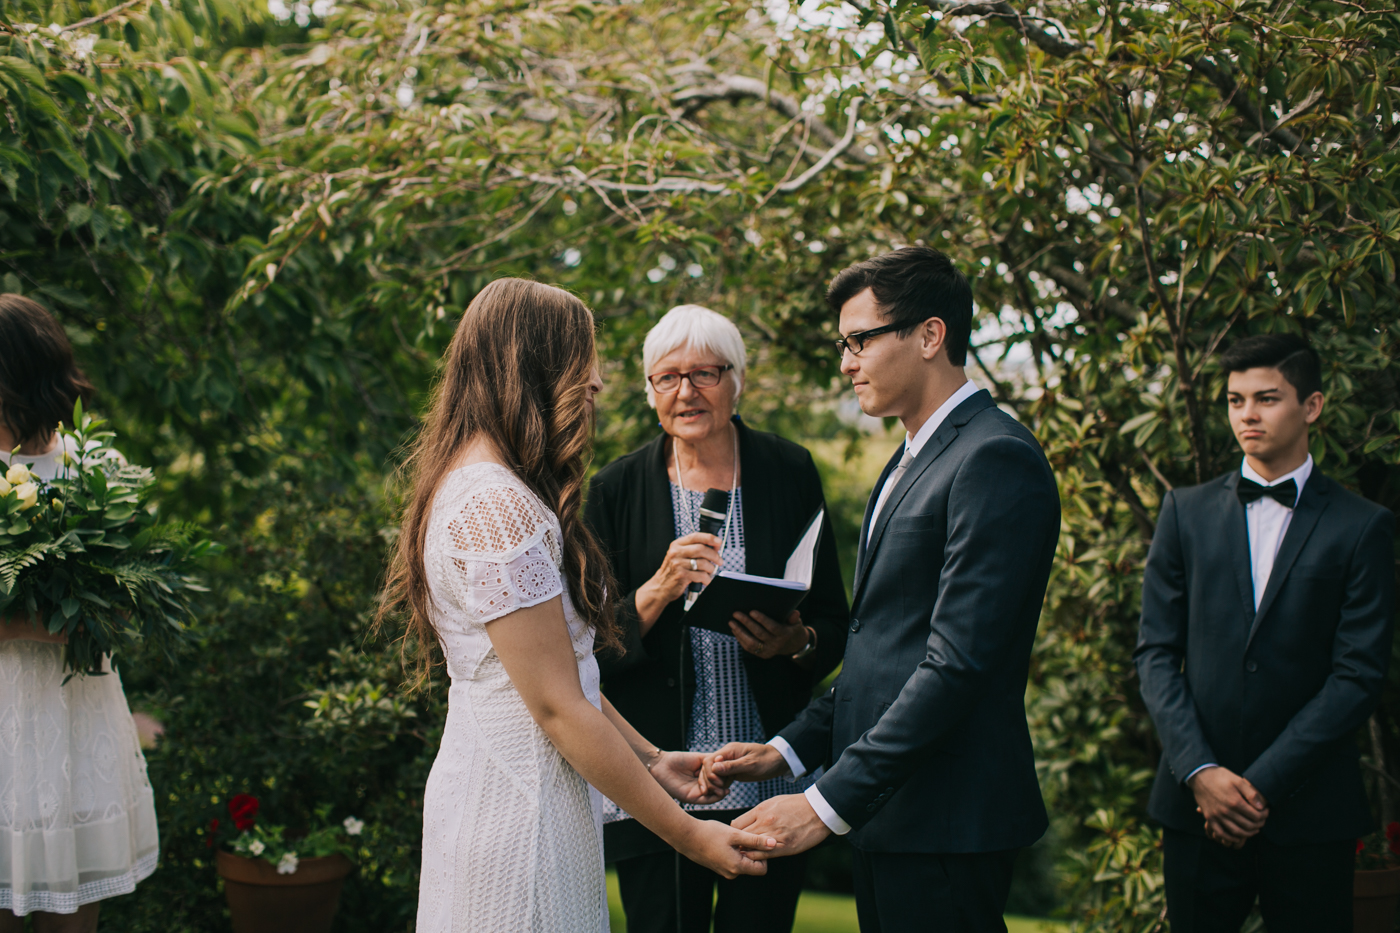 Ariana & Tim - Dunedin, New Zealand Wedding - Destination Wedding - Samantha Heather Photography-85.jpg